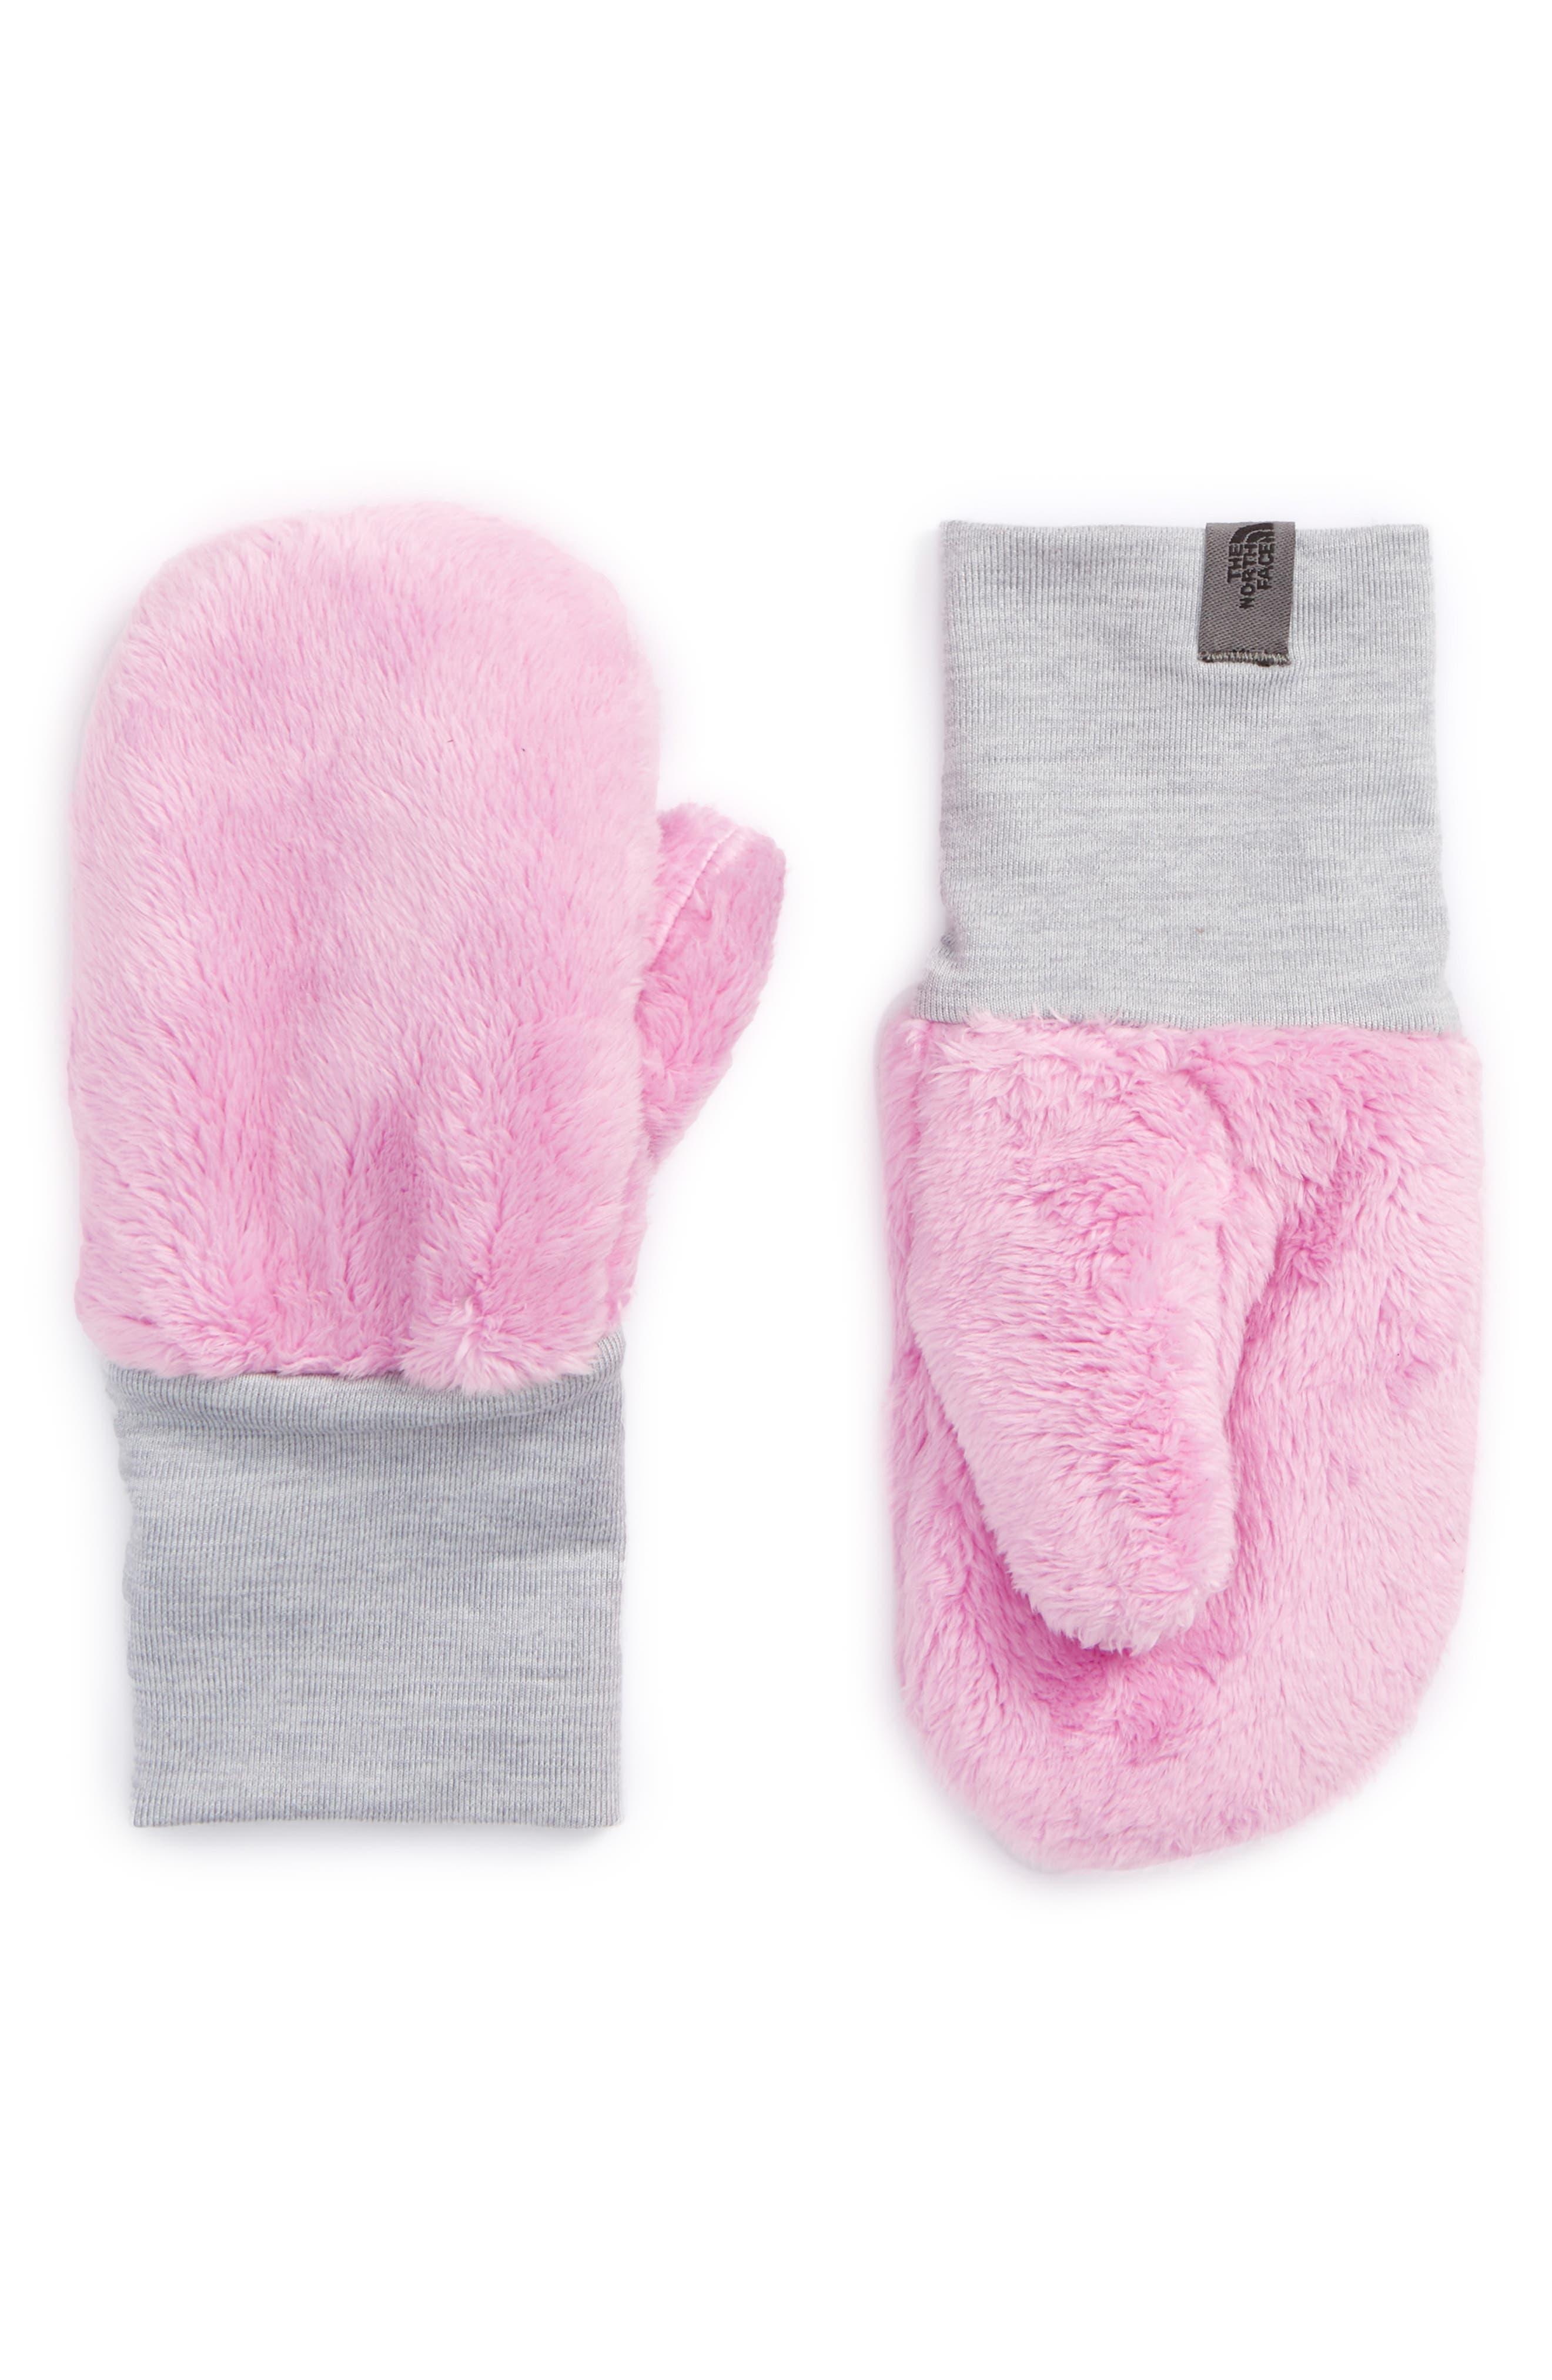 Osilito High Loft Fleece Mittens,                         Main,                         color, Lilac Pink